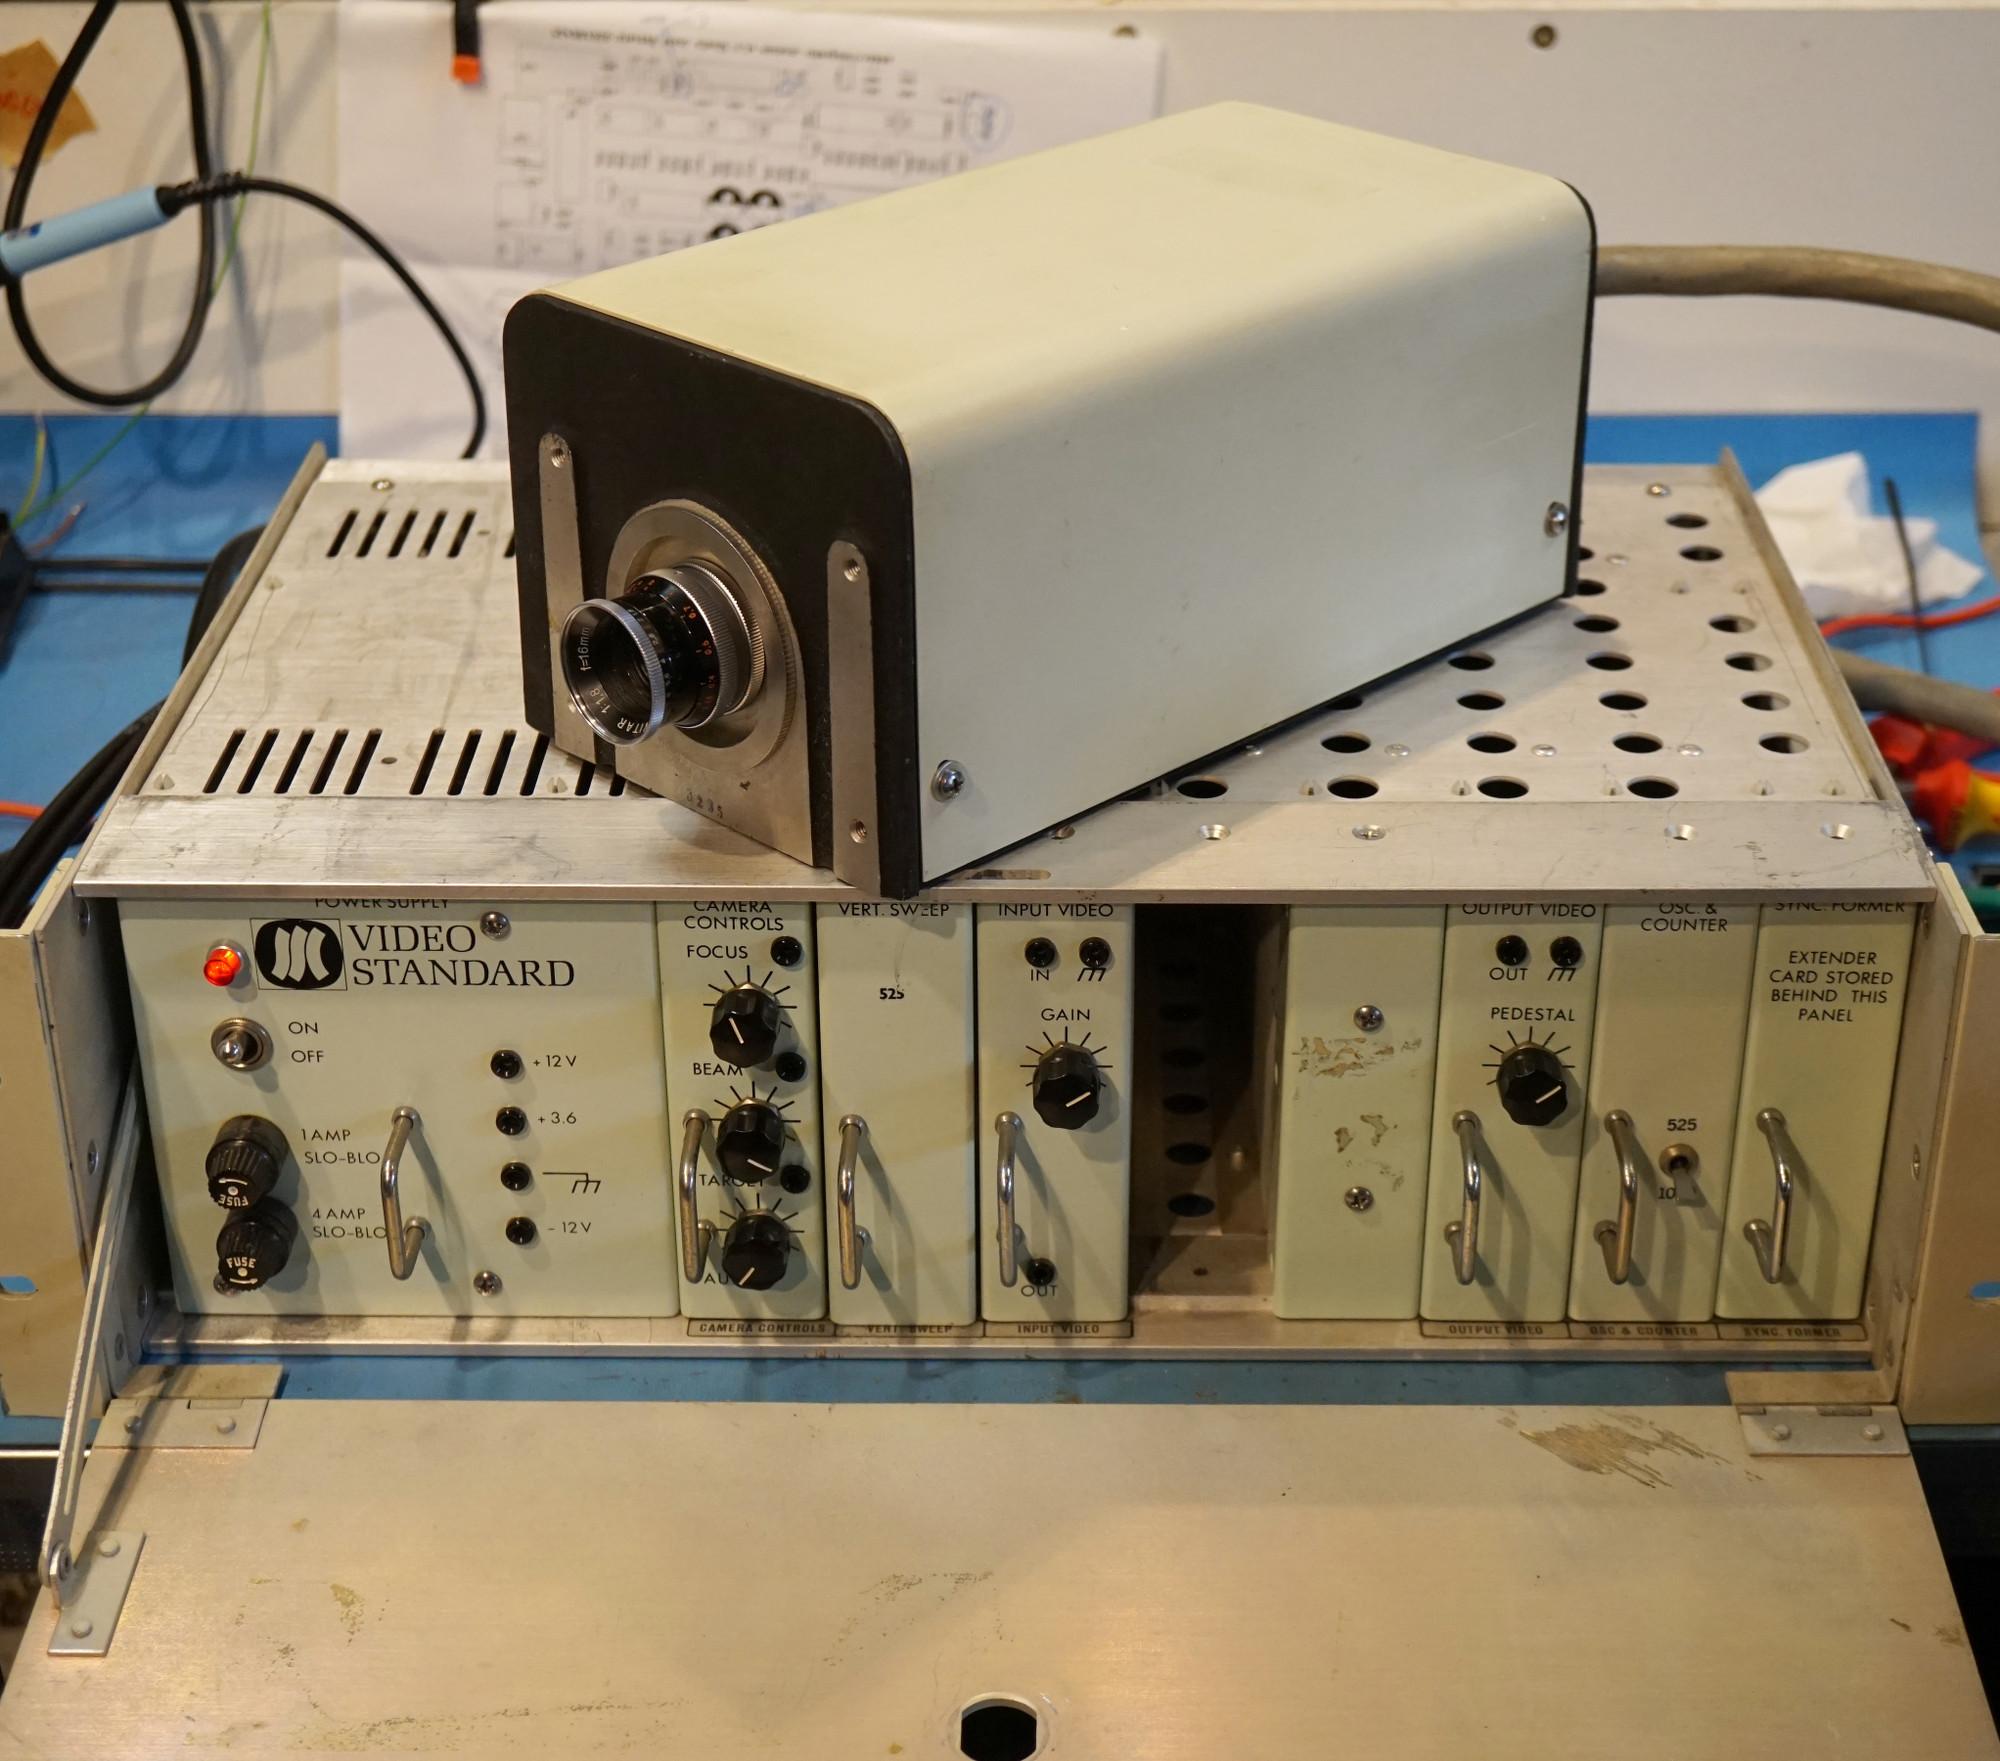 The Sierra Scientific LSV-1 high-resolution camera.